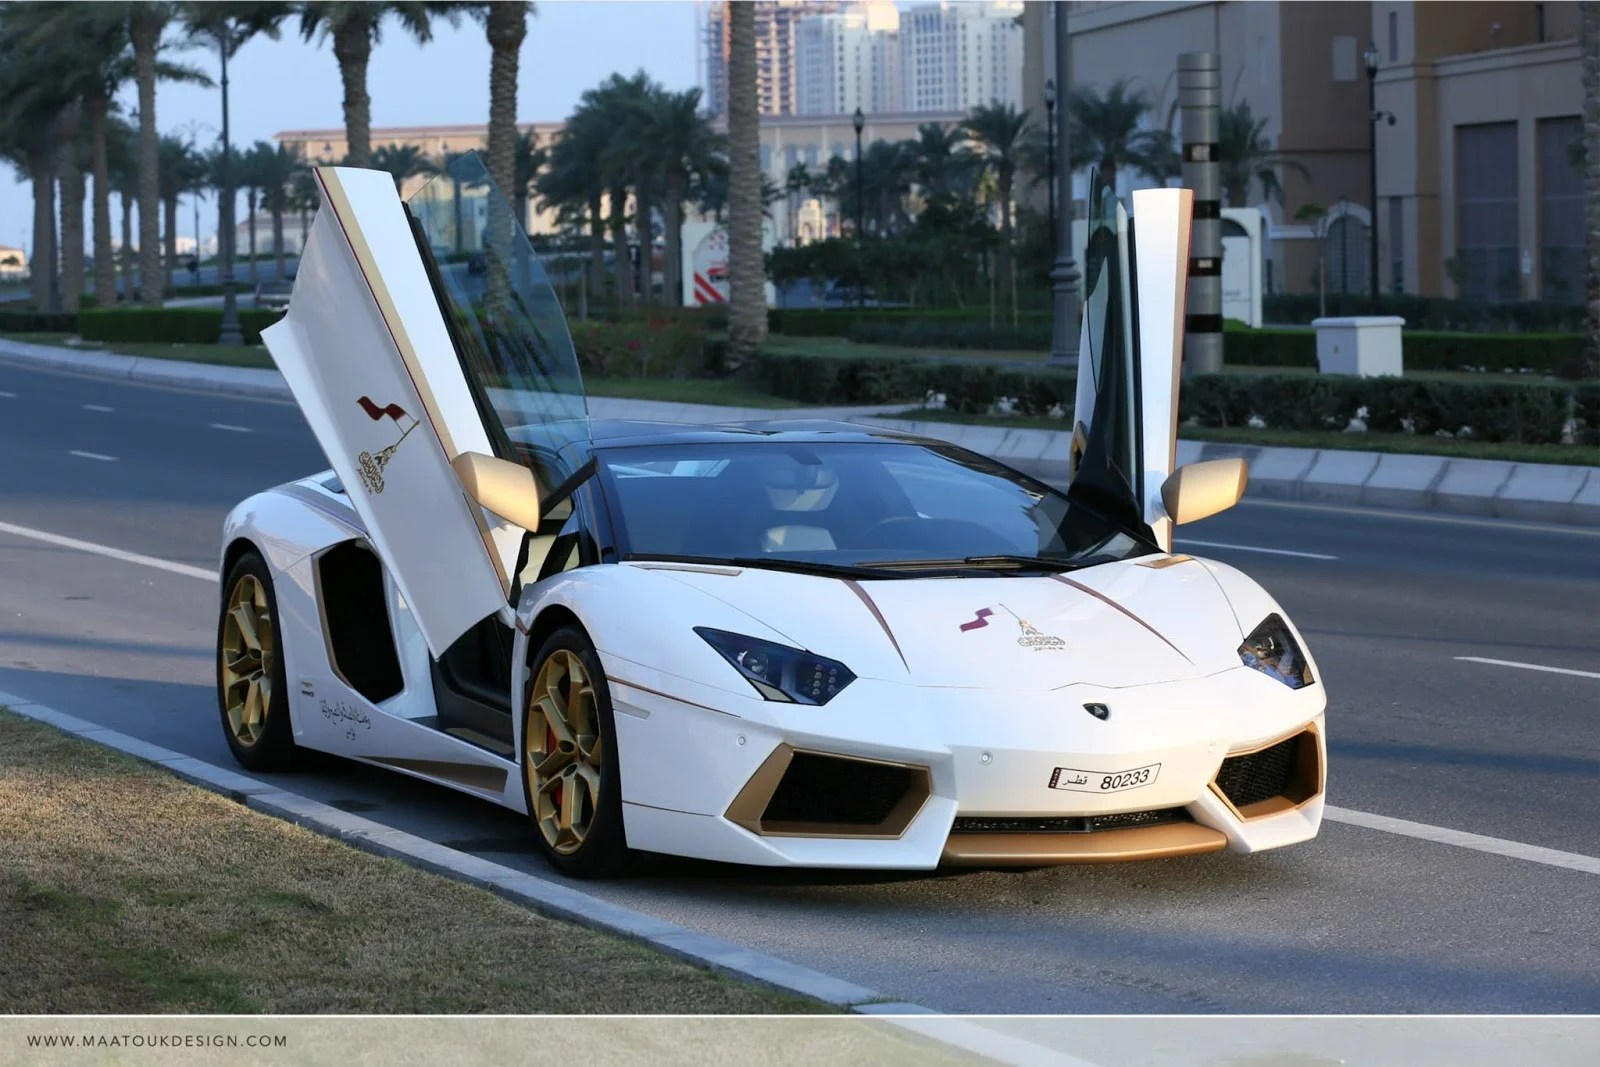 All Car Hd Wallpaper Download Meet The One Off Gold Plated Lamborghini Aventador